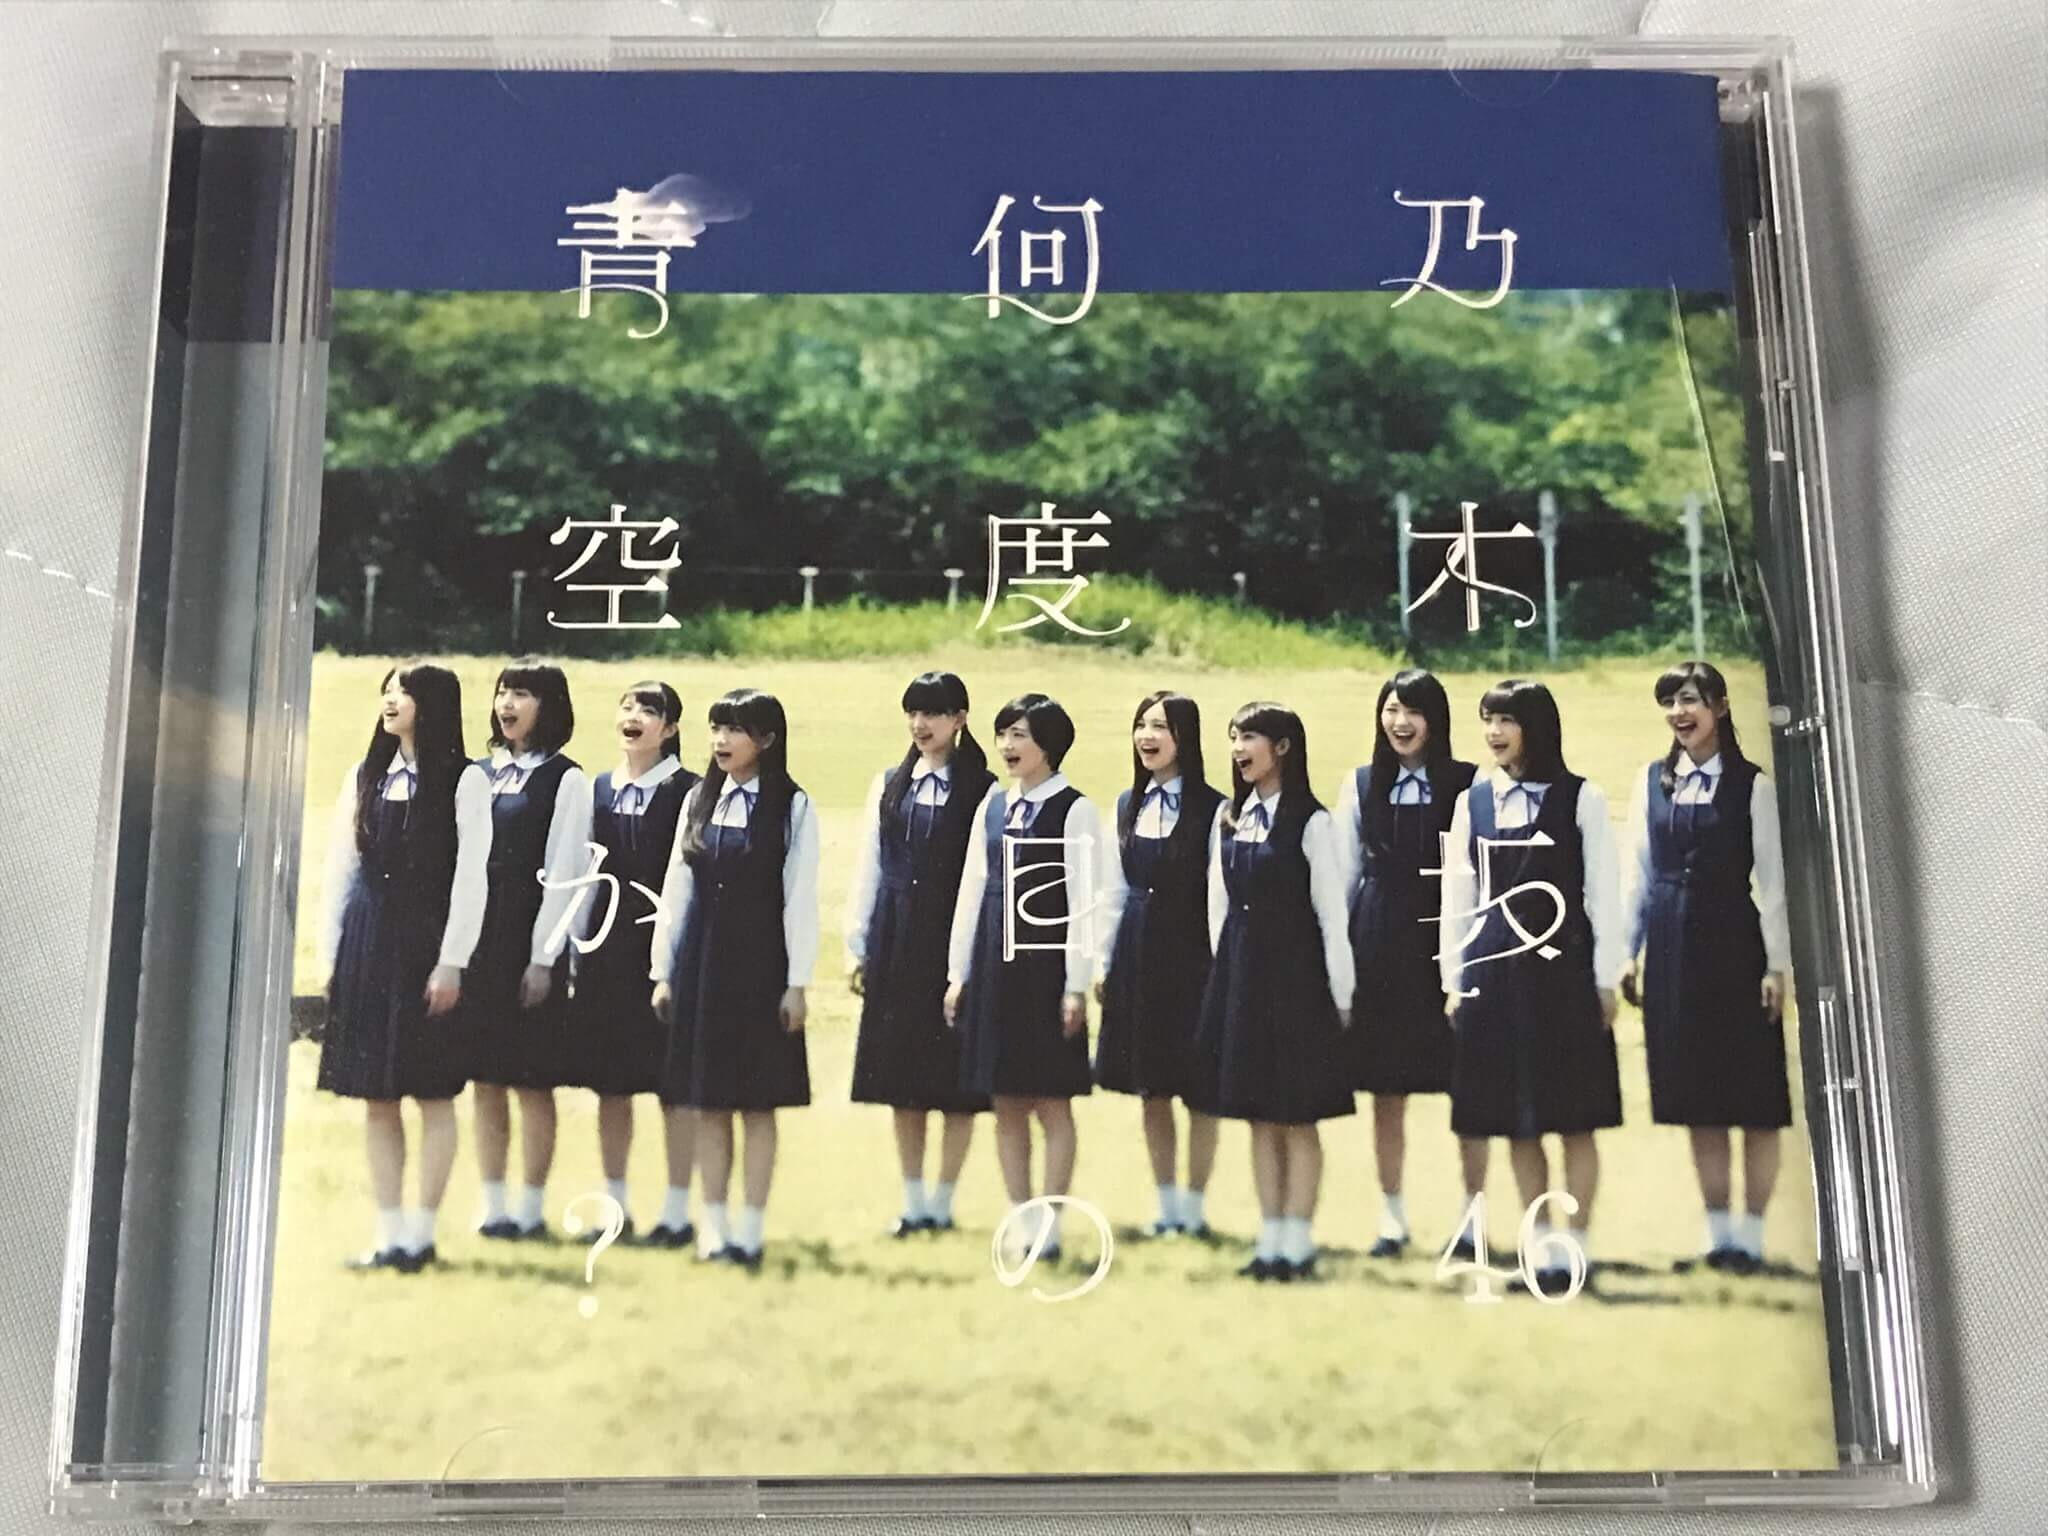 10thシングル「何度目の青空か」のすべて!収録曲や特典映像、MV、フォーメーション情報などを紹介!